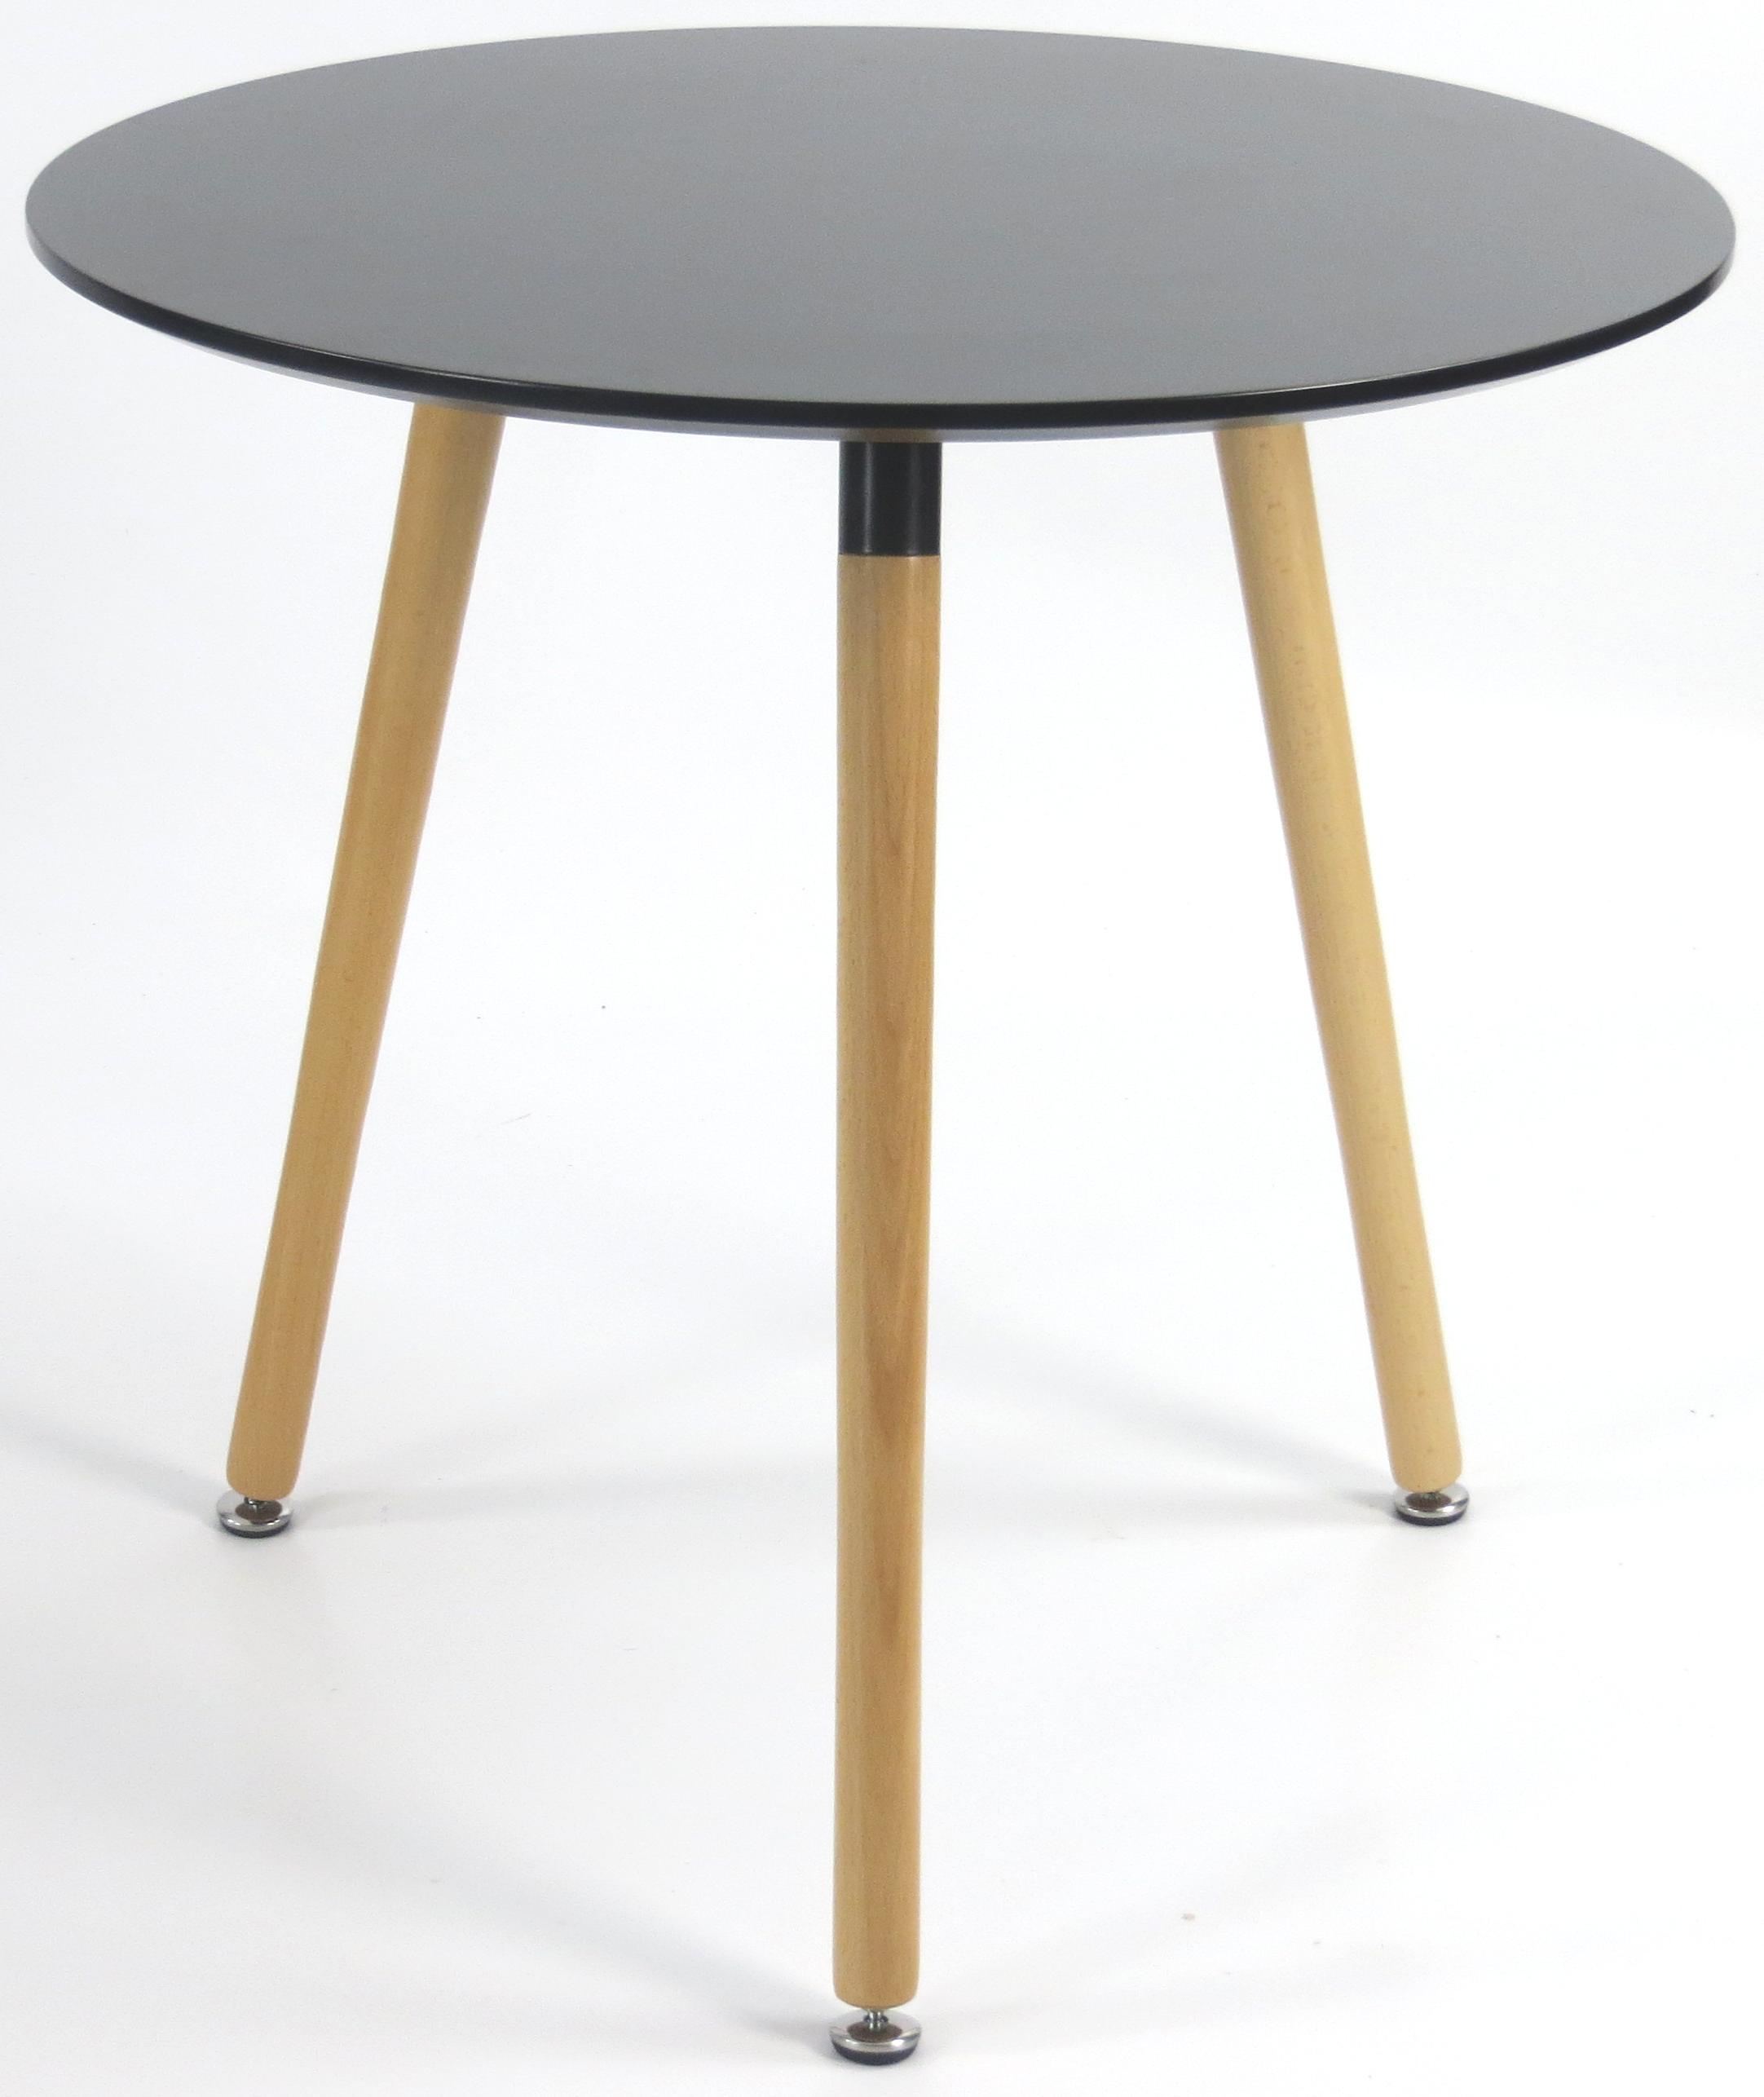 tische retro. Black Bedroom Furniture Sets. Home Design Ideas